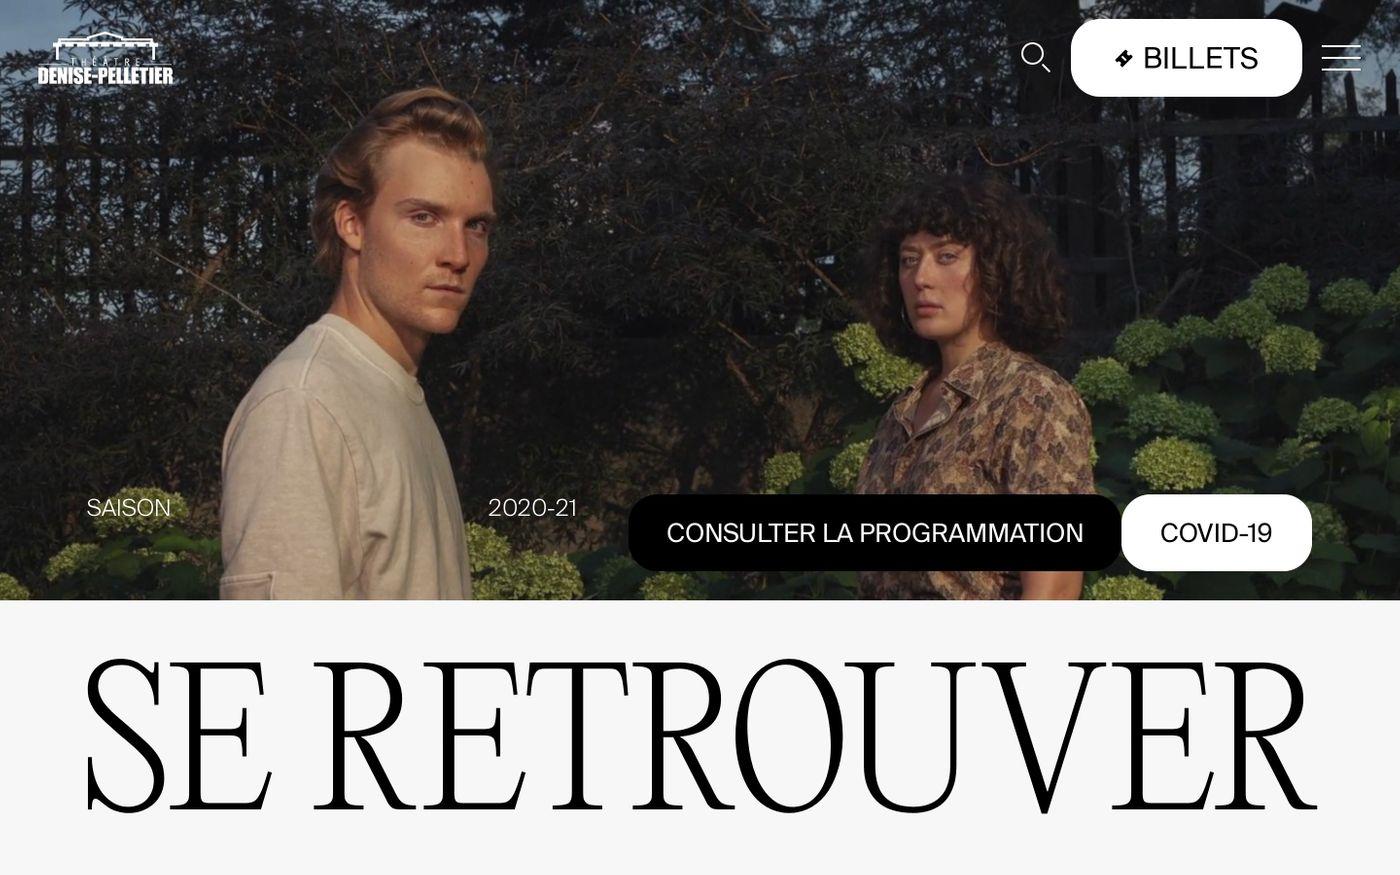 Screenshot of Théâtre Denise-Pelletier website